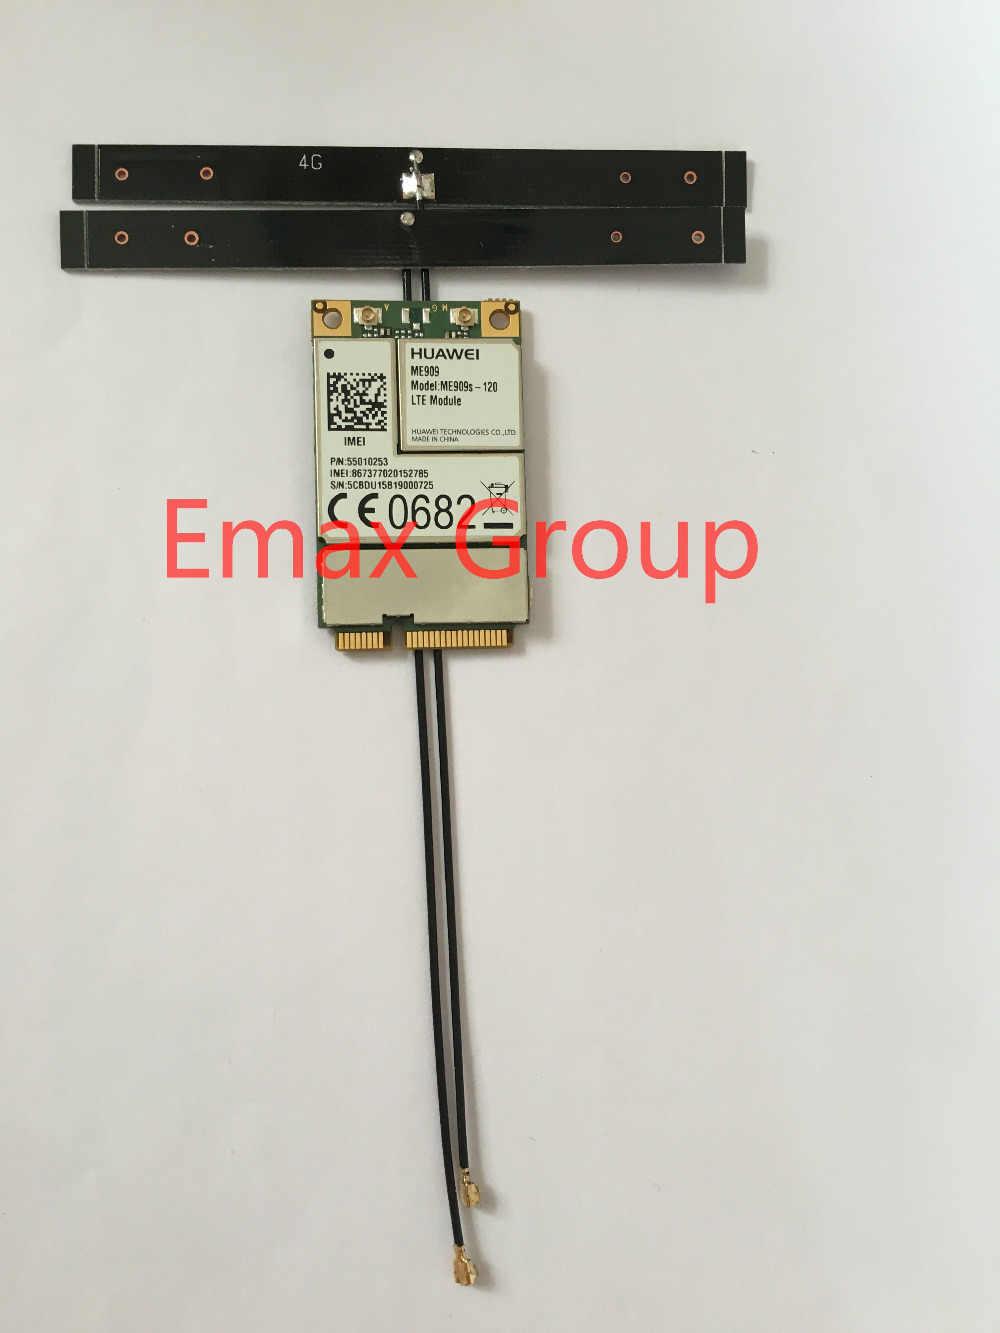 Di trasporto libero Mini PCIE ME909S-120 + 2 pz 15 cm 4g TDD-LTE FDD-LTE Antenna Interna B1/B2/ b3/B5/B7/B8/B20 JINYUSHI magazzino